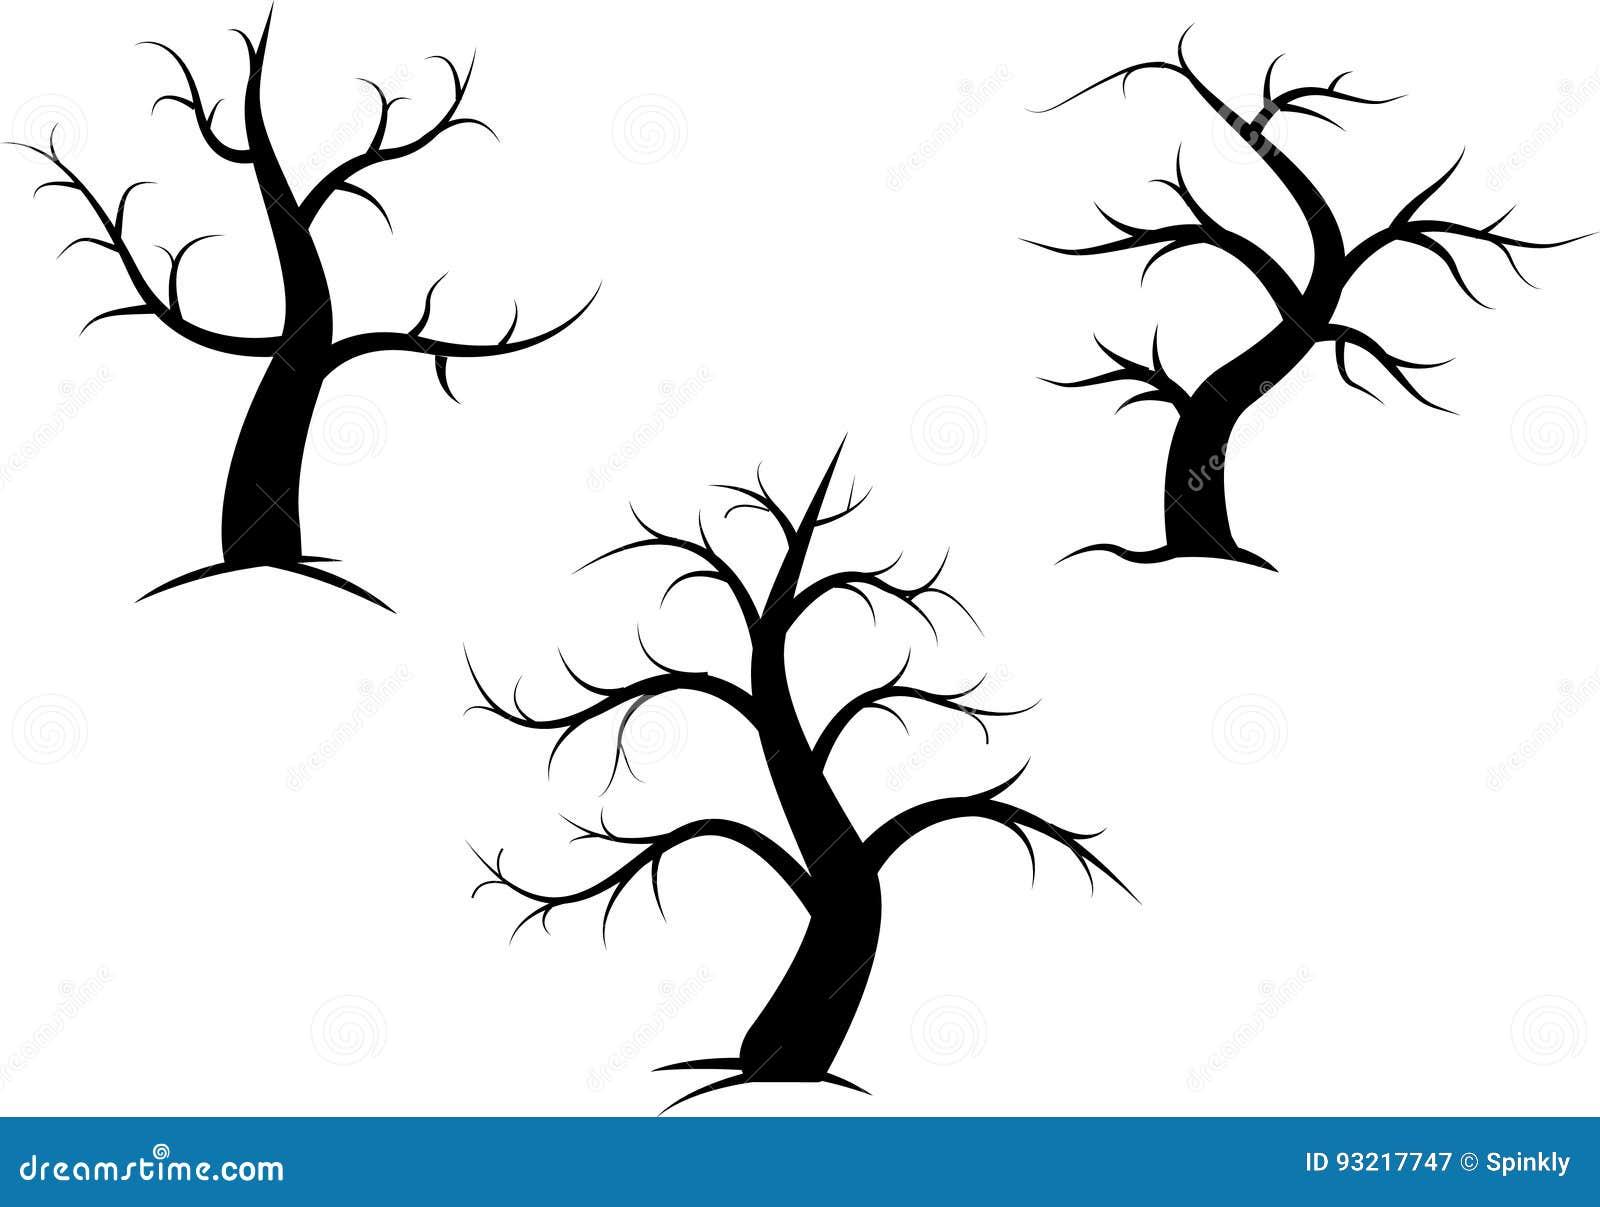 Tree Without Leaves Stock Illustration Illustration Of Adapt 93217747